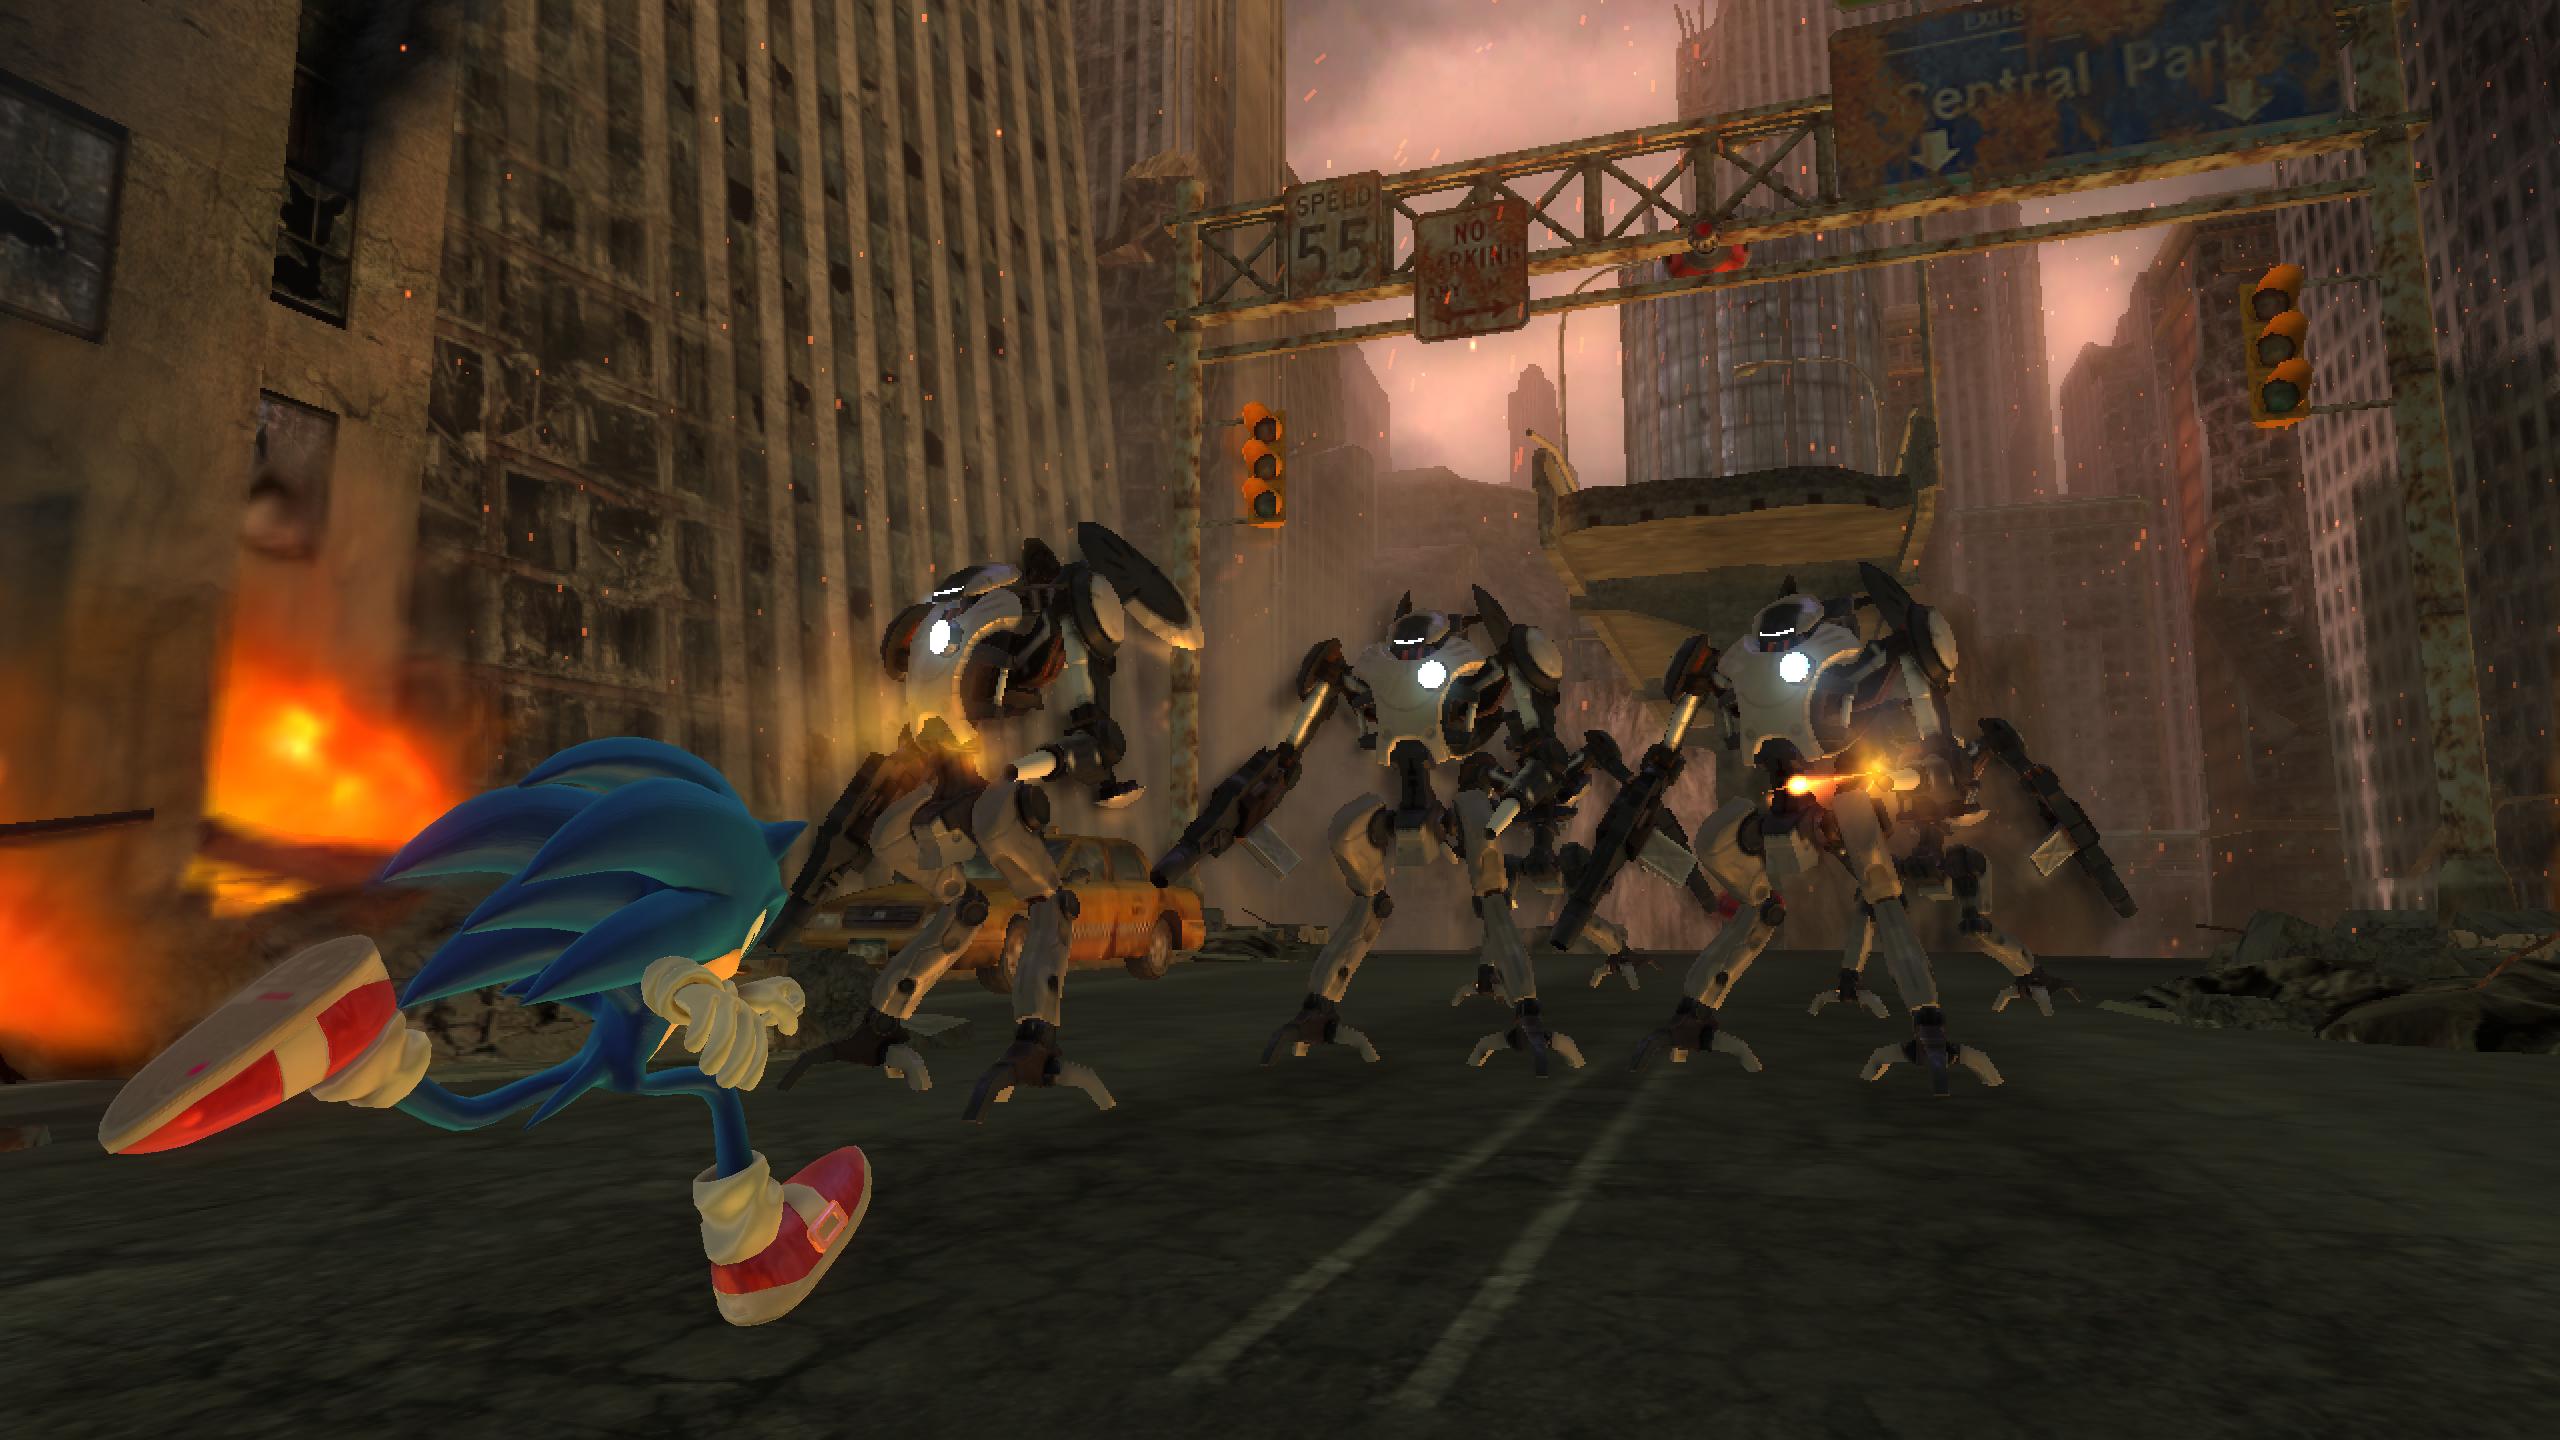 File:Sonic06screen49.jpg